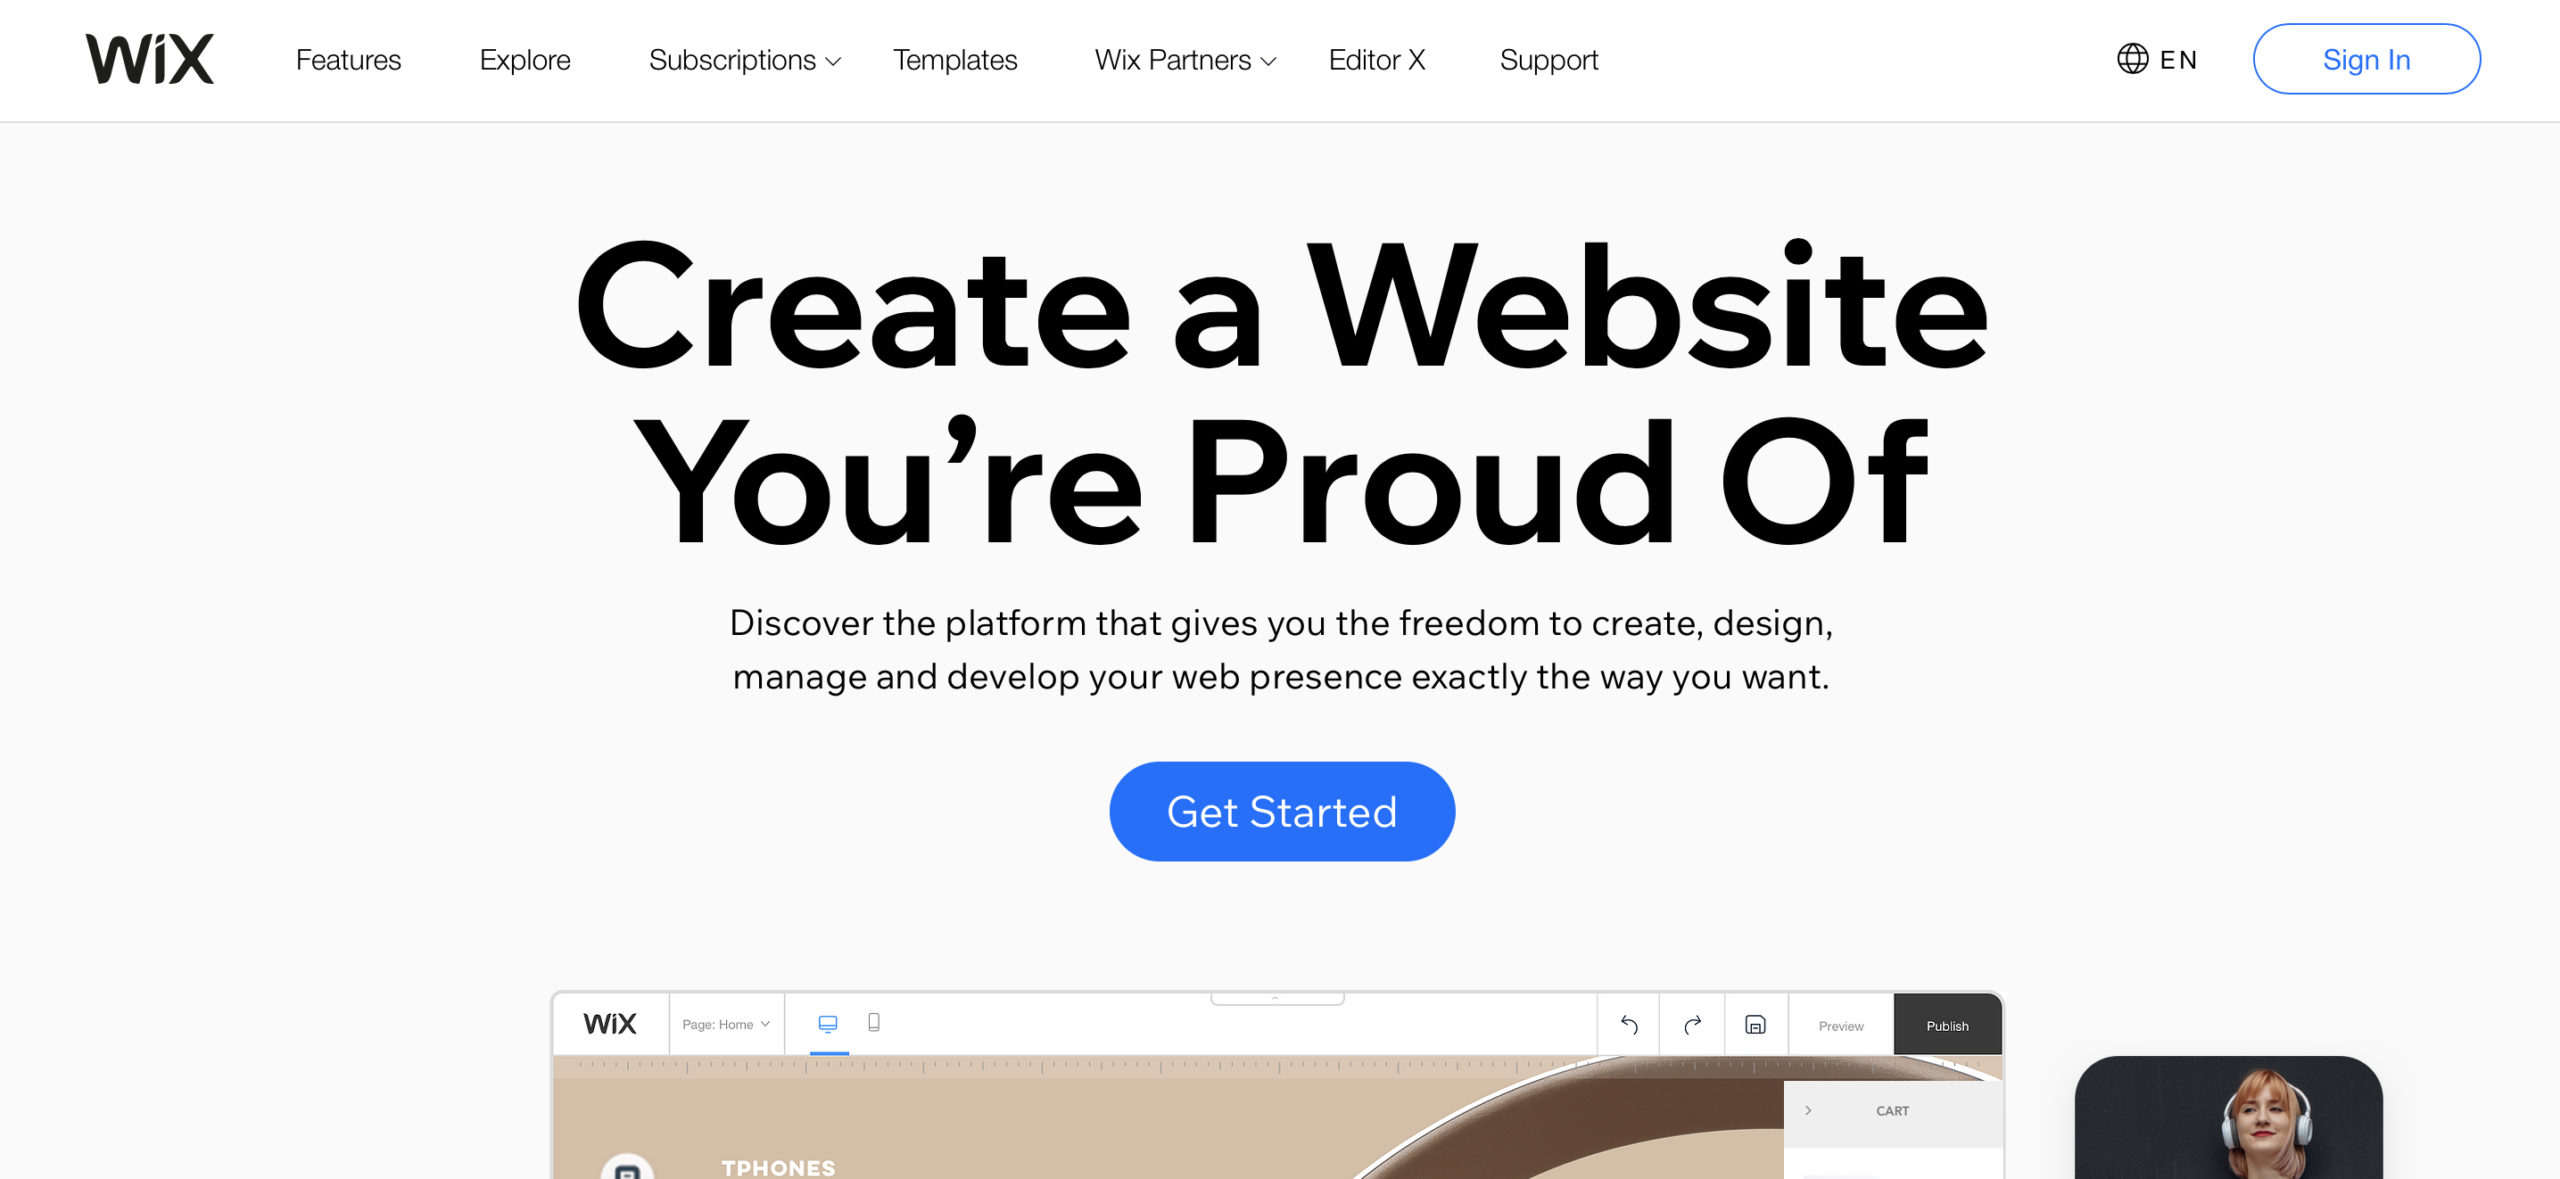 Wix website builder homepage screenshot